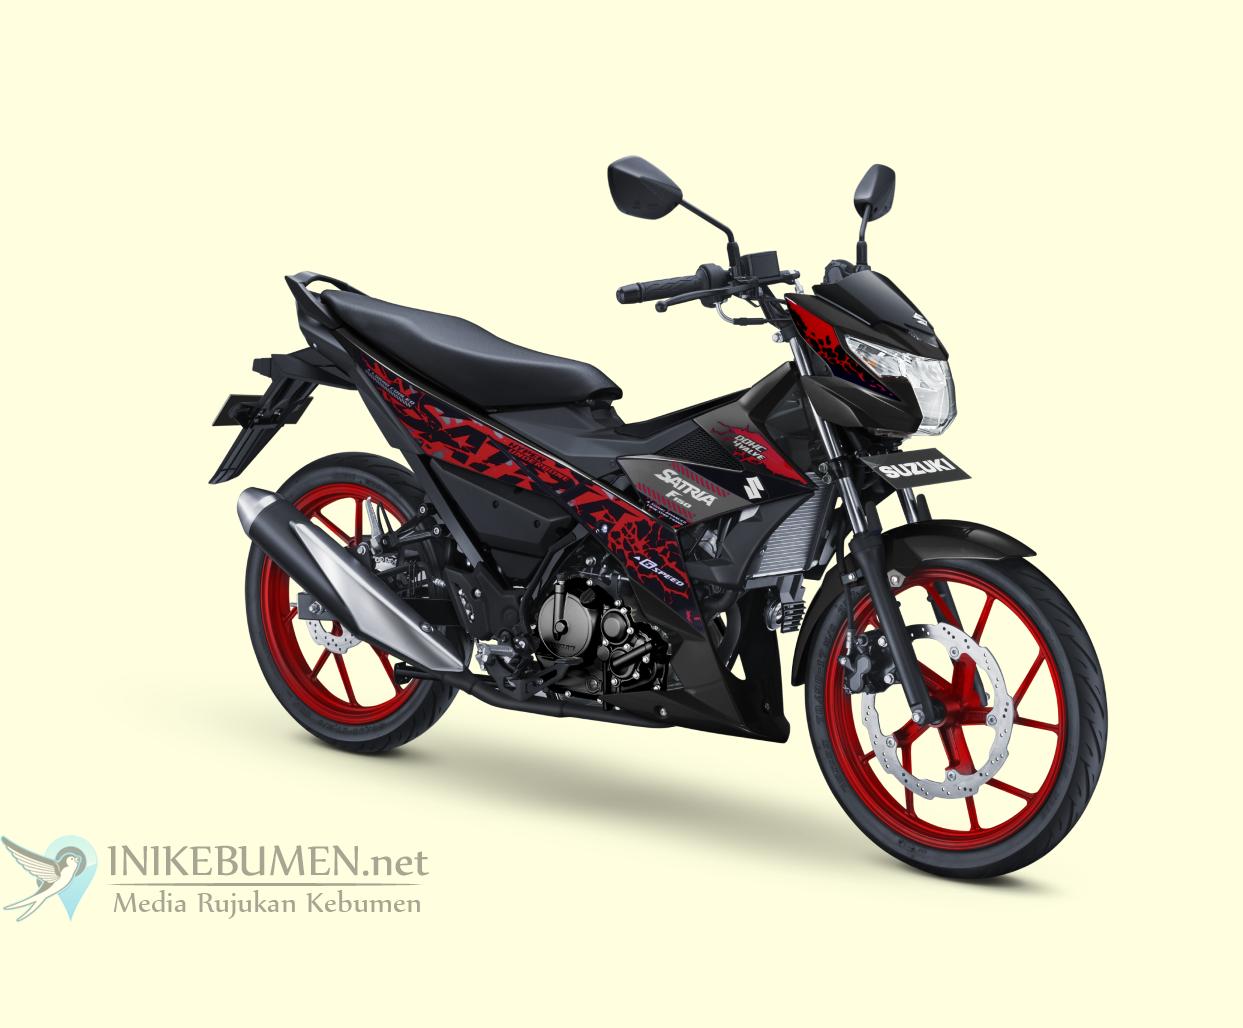 Warna Baru Suzuki All New Satria F150, Aktualisasi Diri Gaya Berani Satria